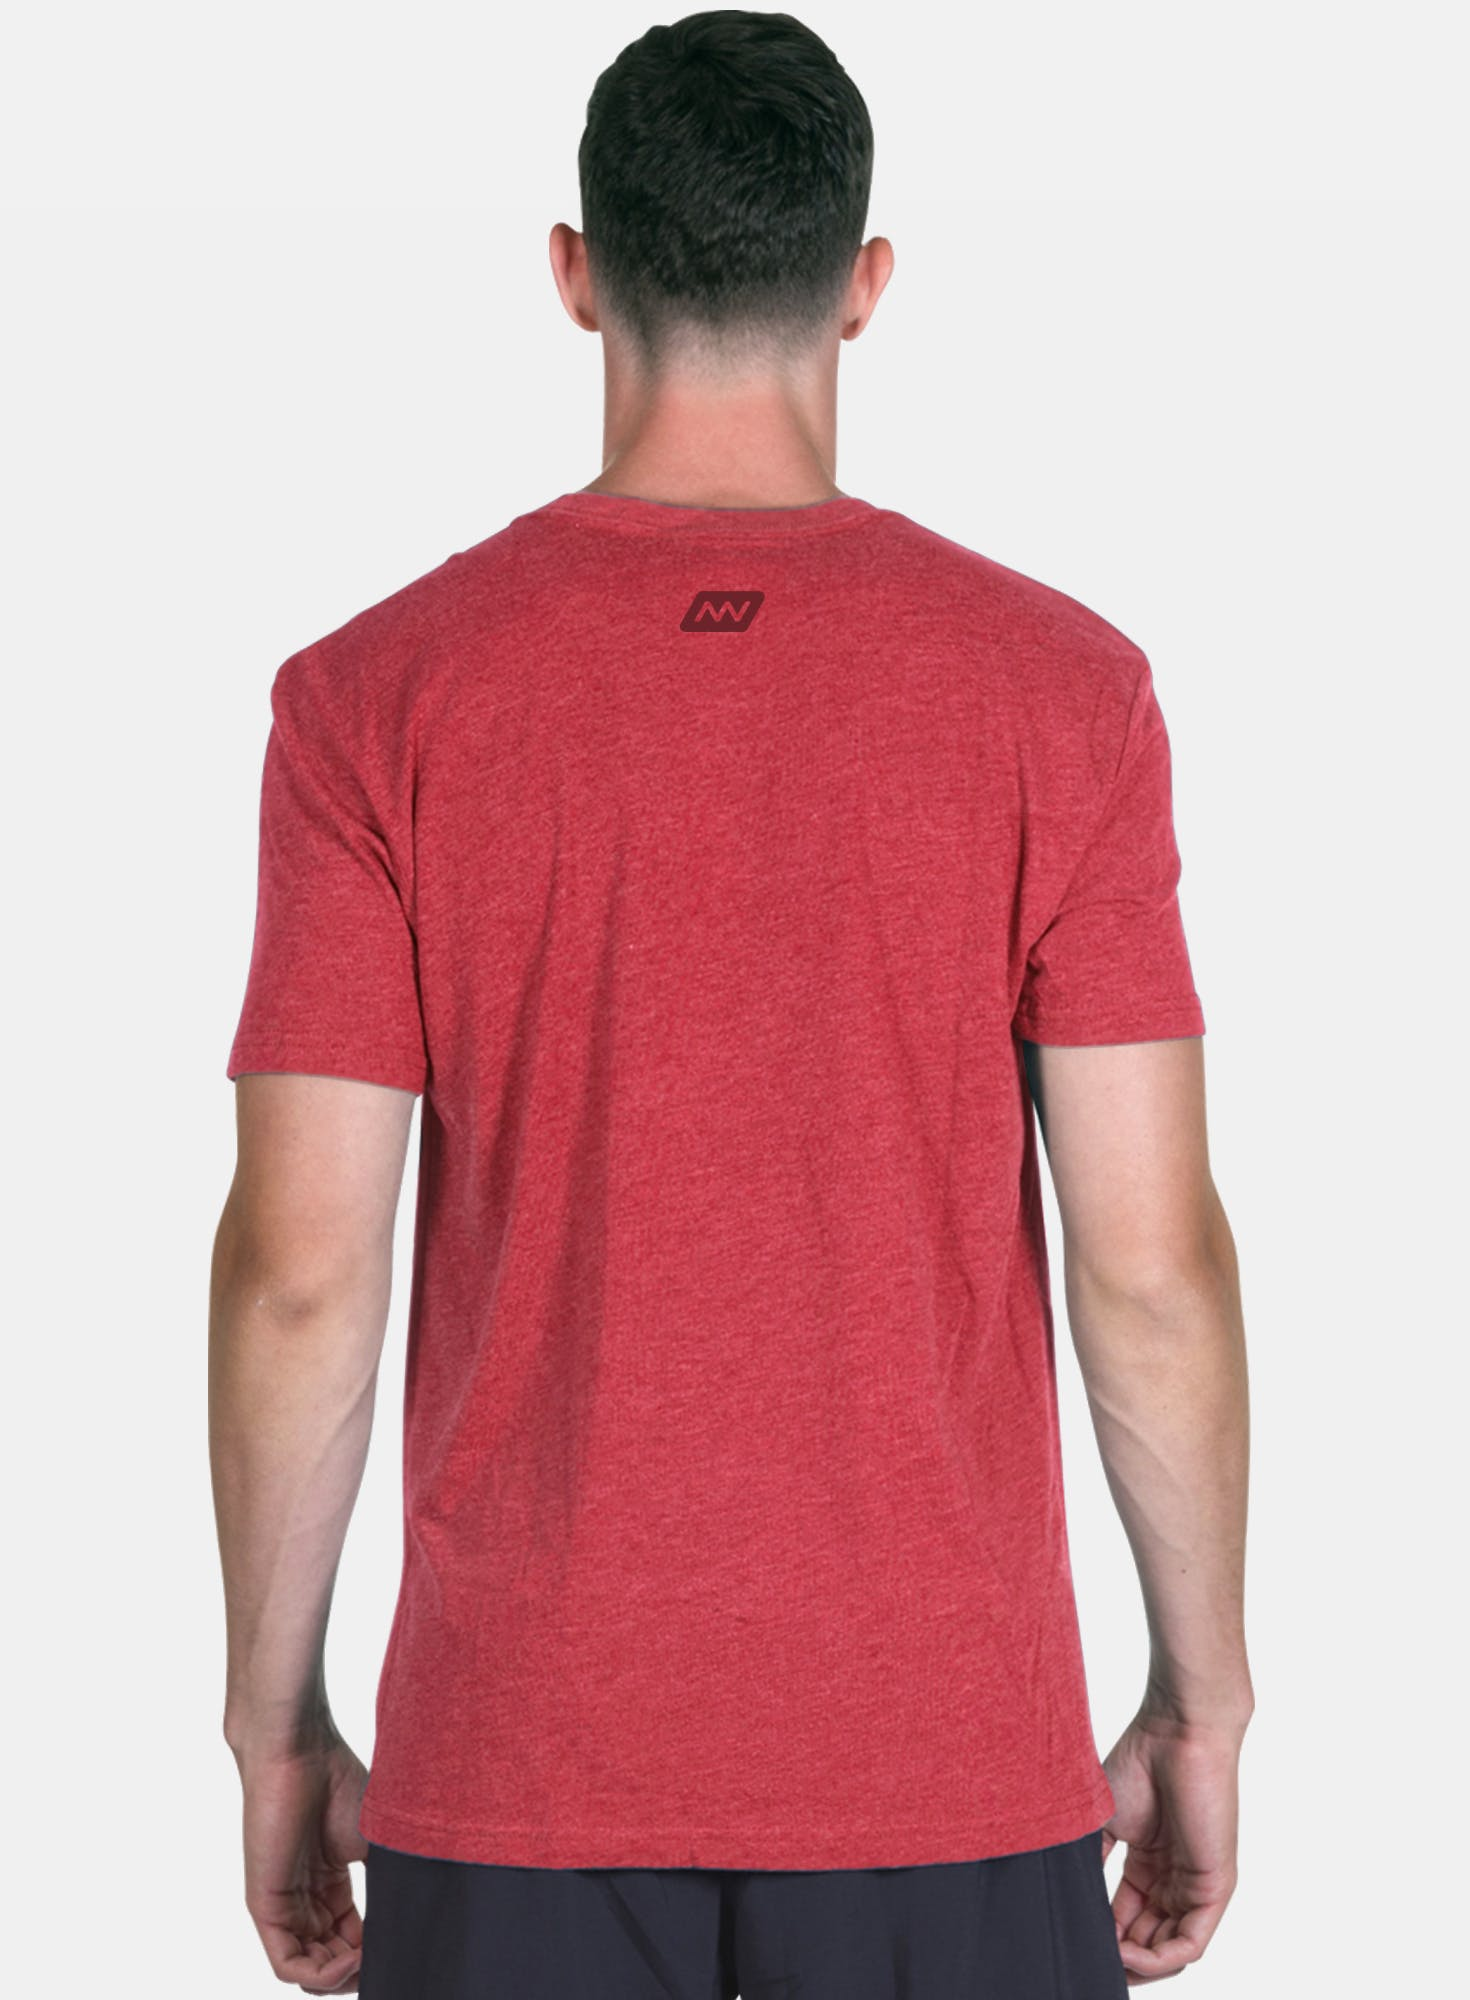 Onnit All You Tri-Blend T-Shirt Bonus Image